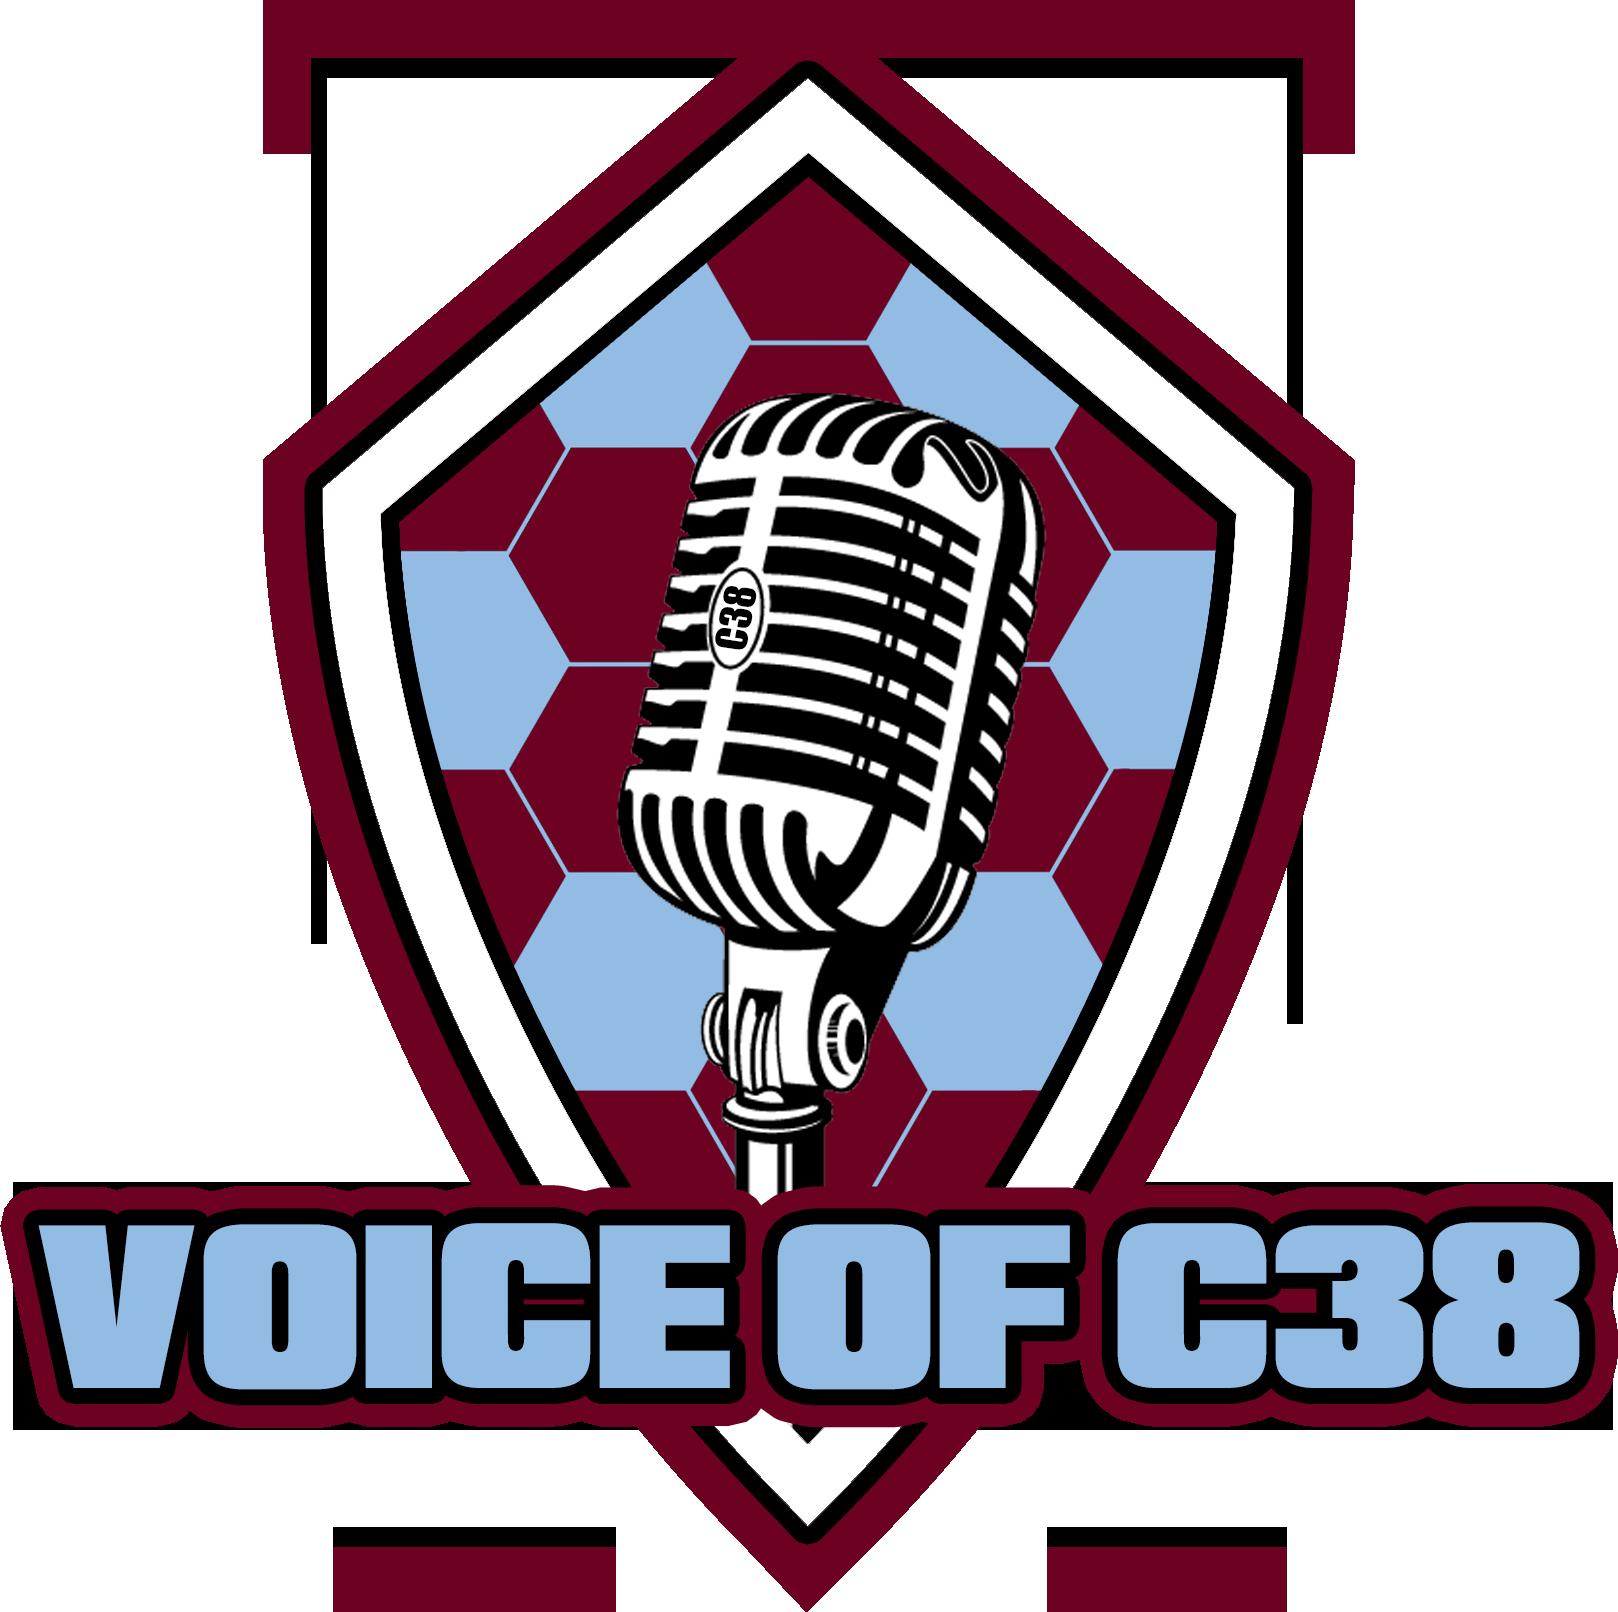 Voice of C38 show art